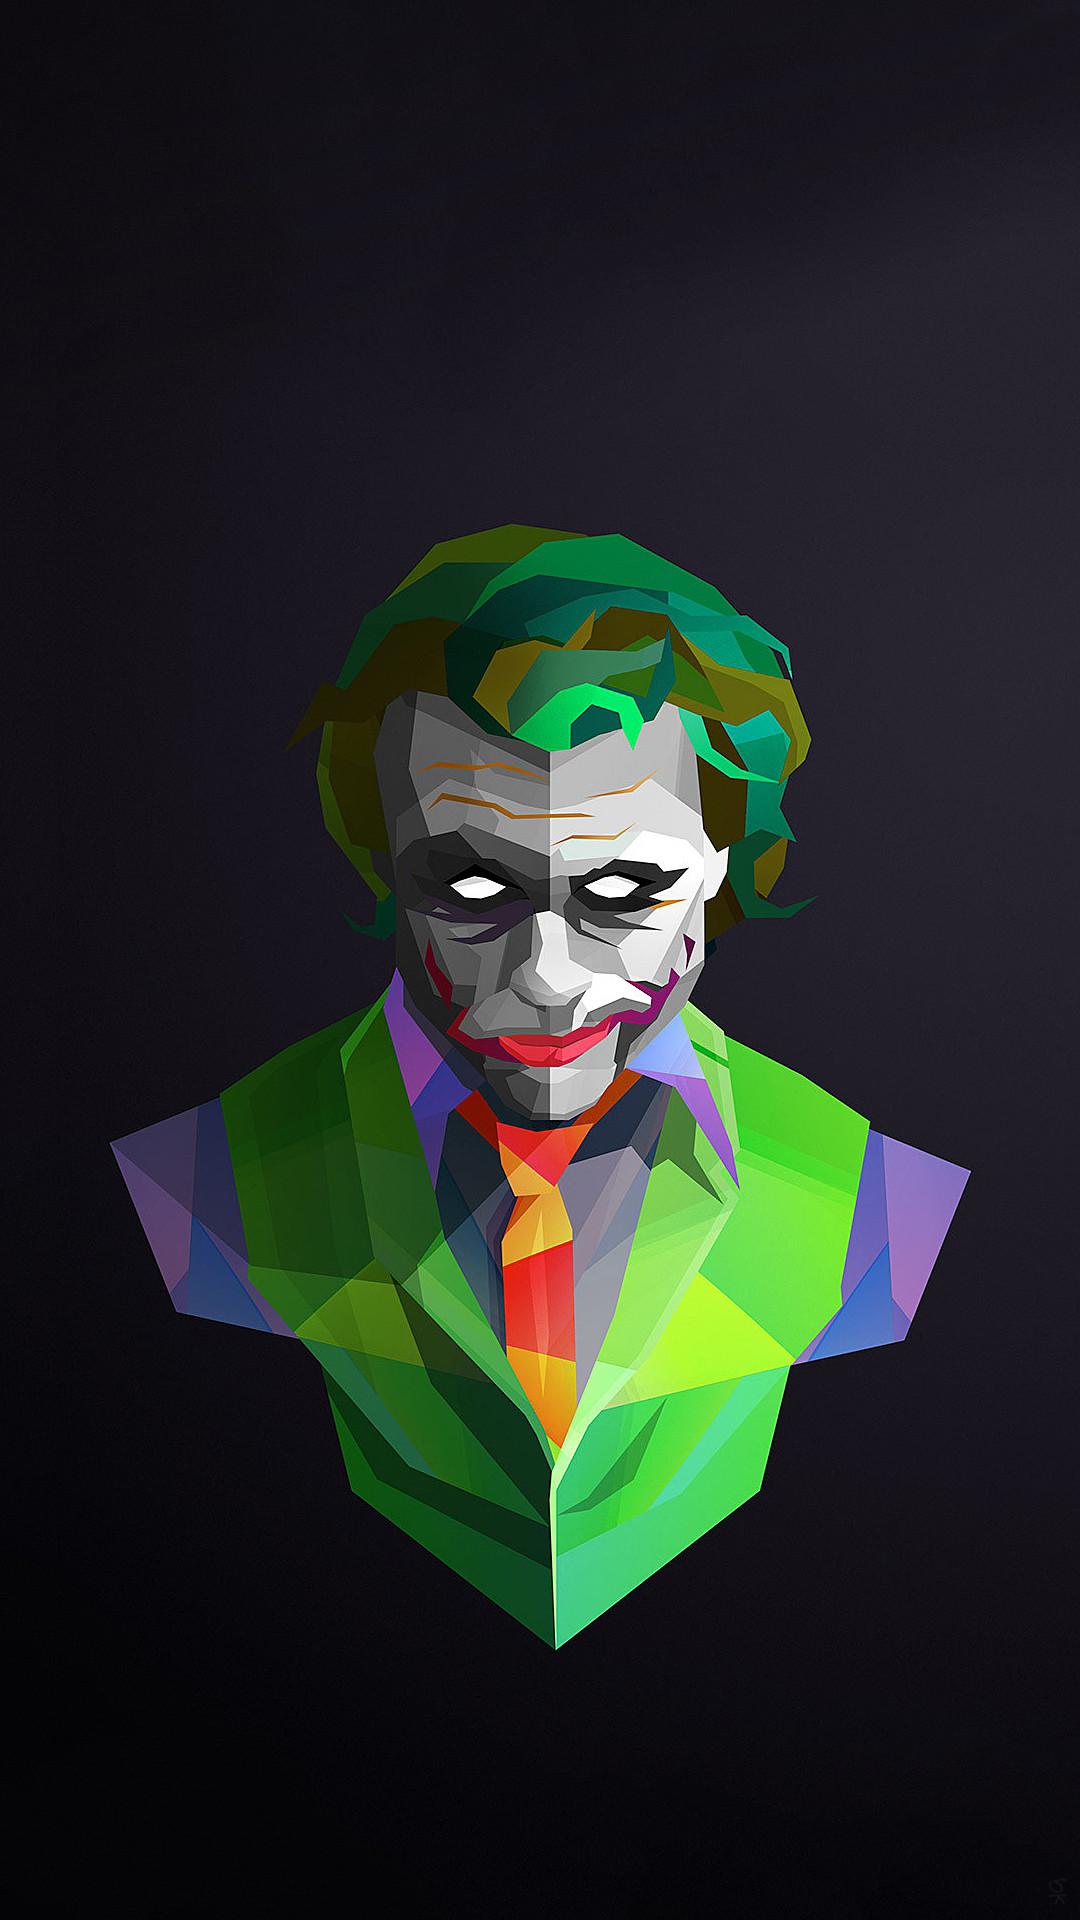 1080x1920 Joker IPhone 6 Plus Wallpaper